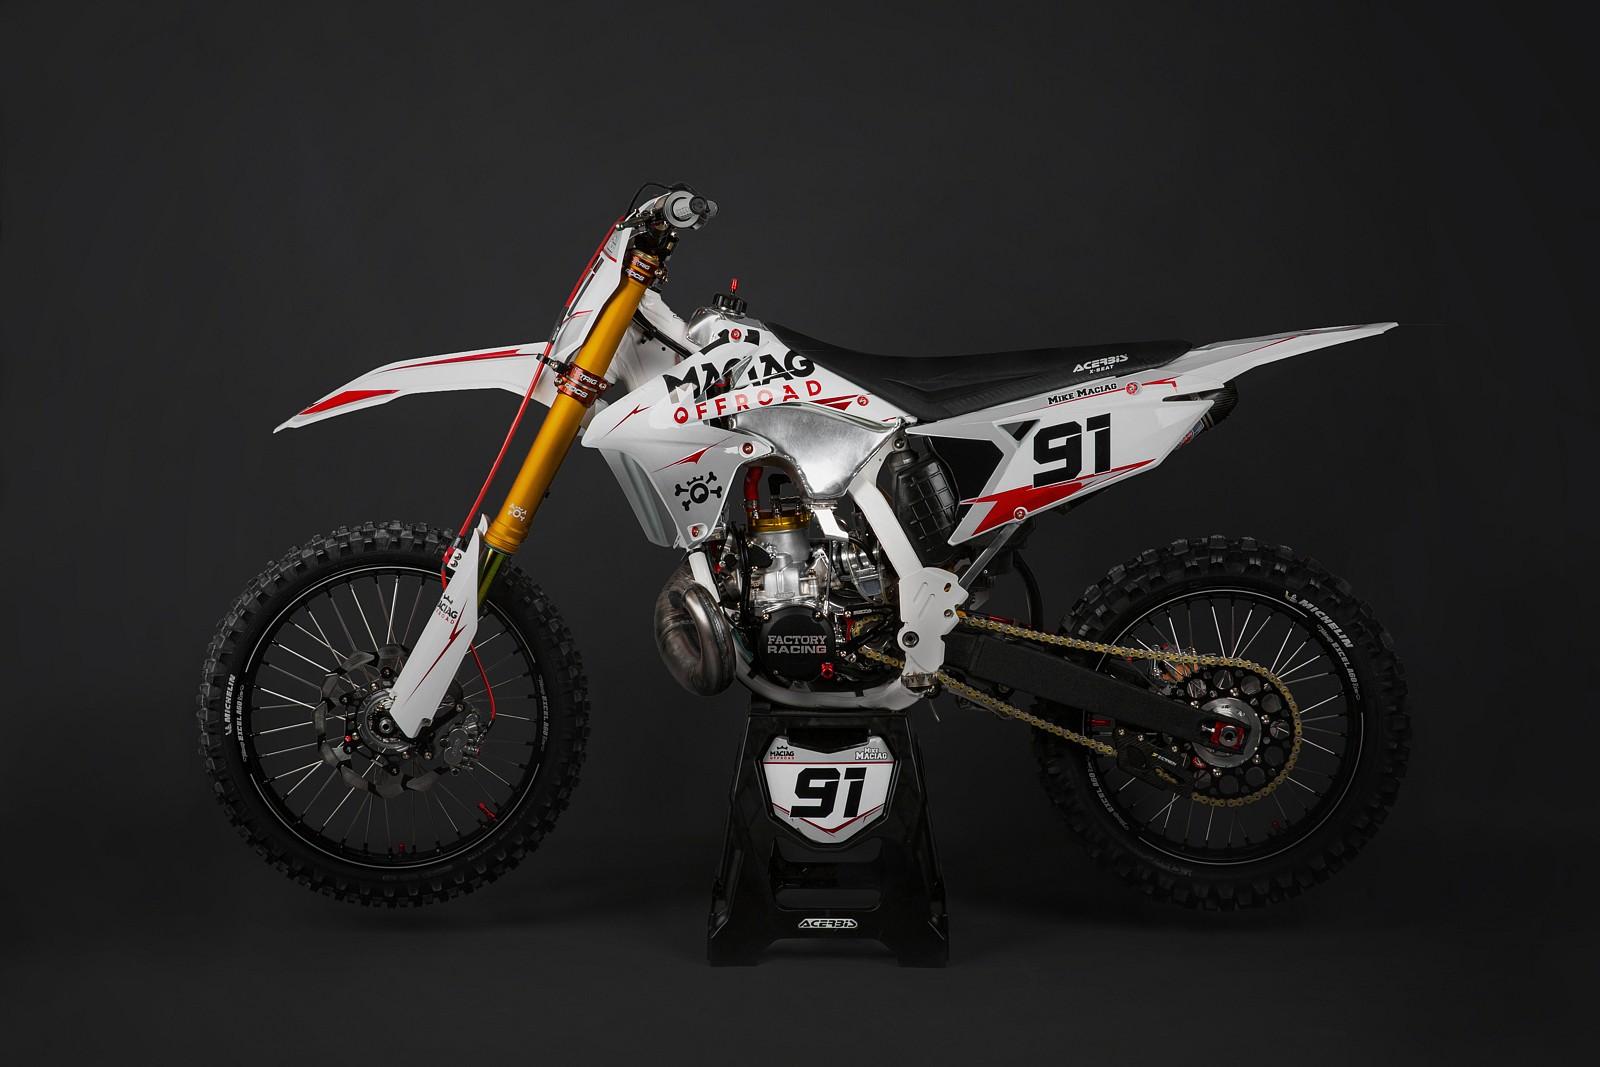 Suzuki RM 250 1 - Mike Maciag - Motocross Pictures - Vital MX